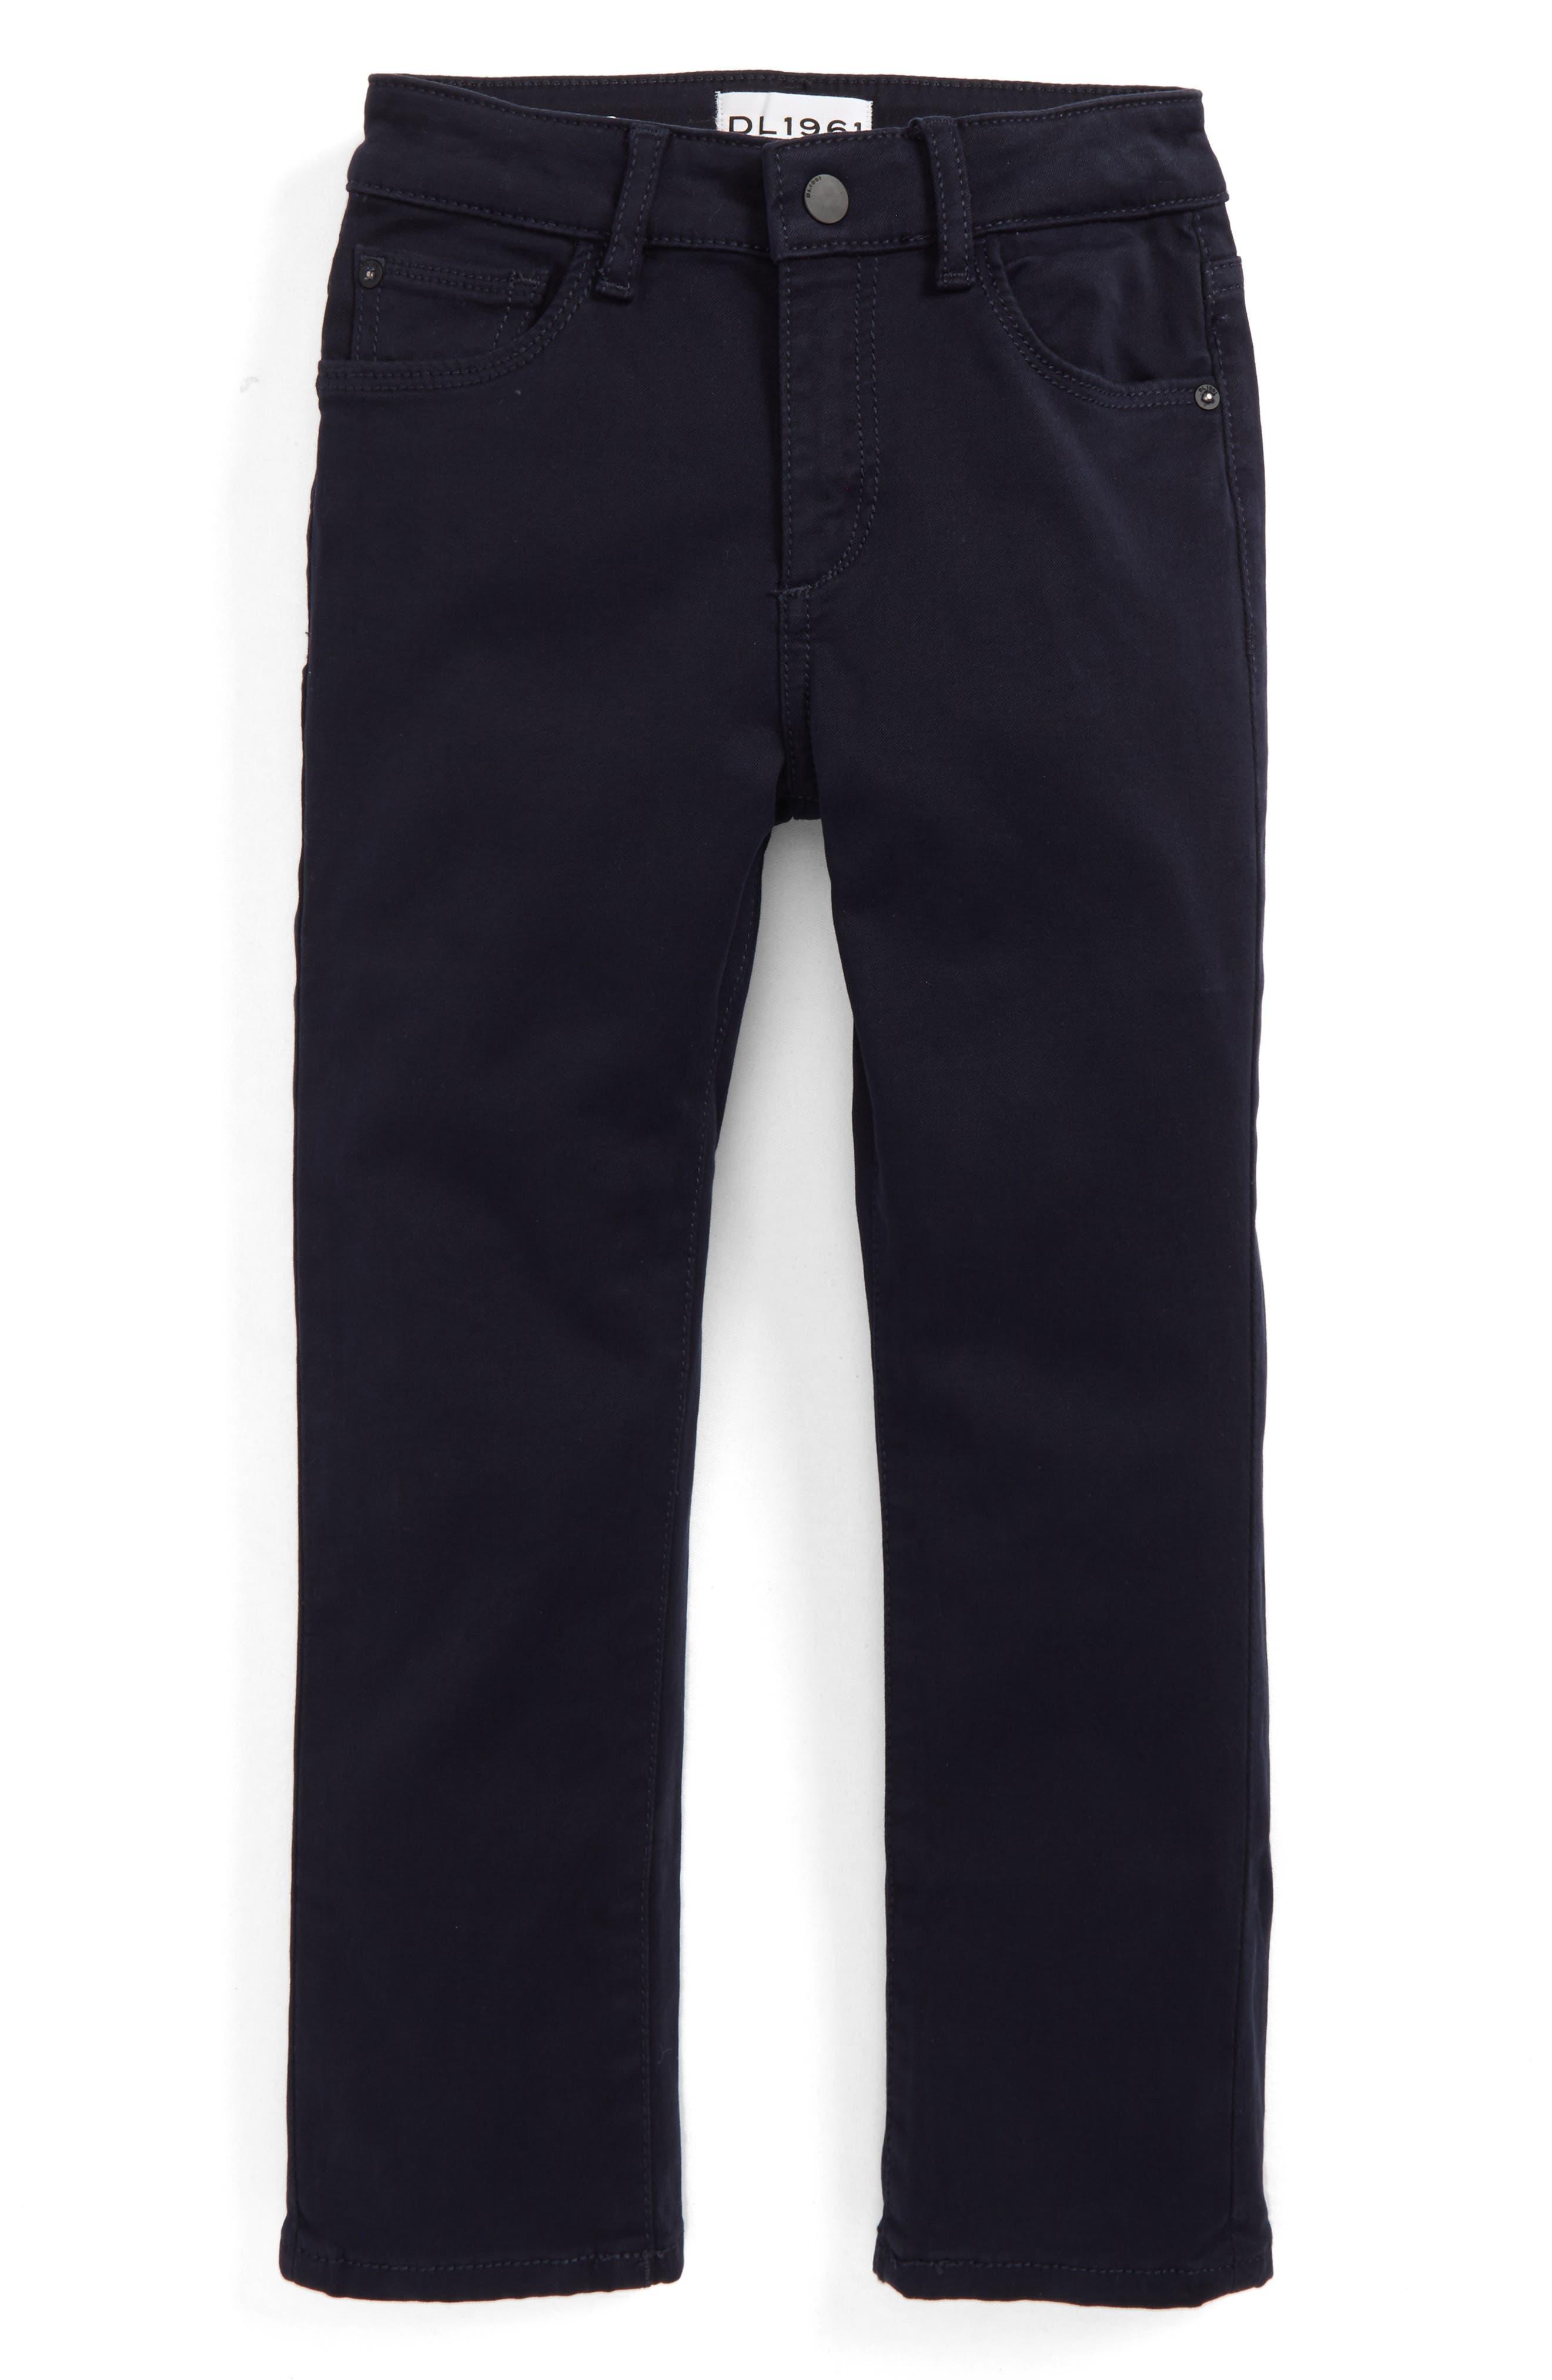 DL1961 Brady Slim Fit Twill Pants (Toddler Boys & Little Boys)